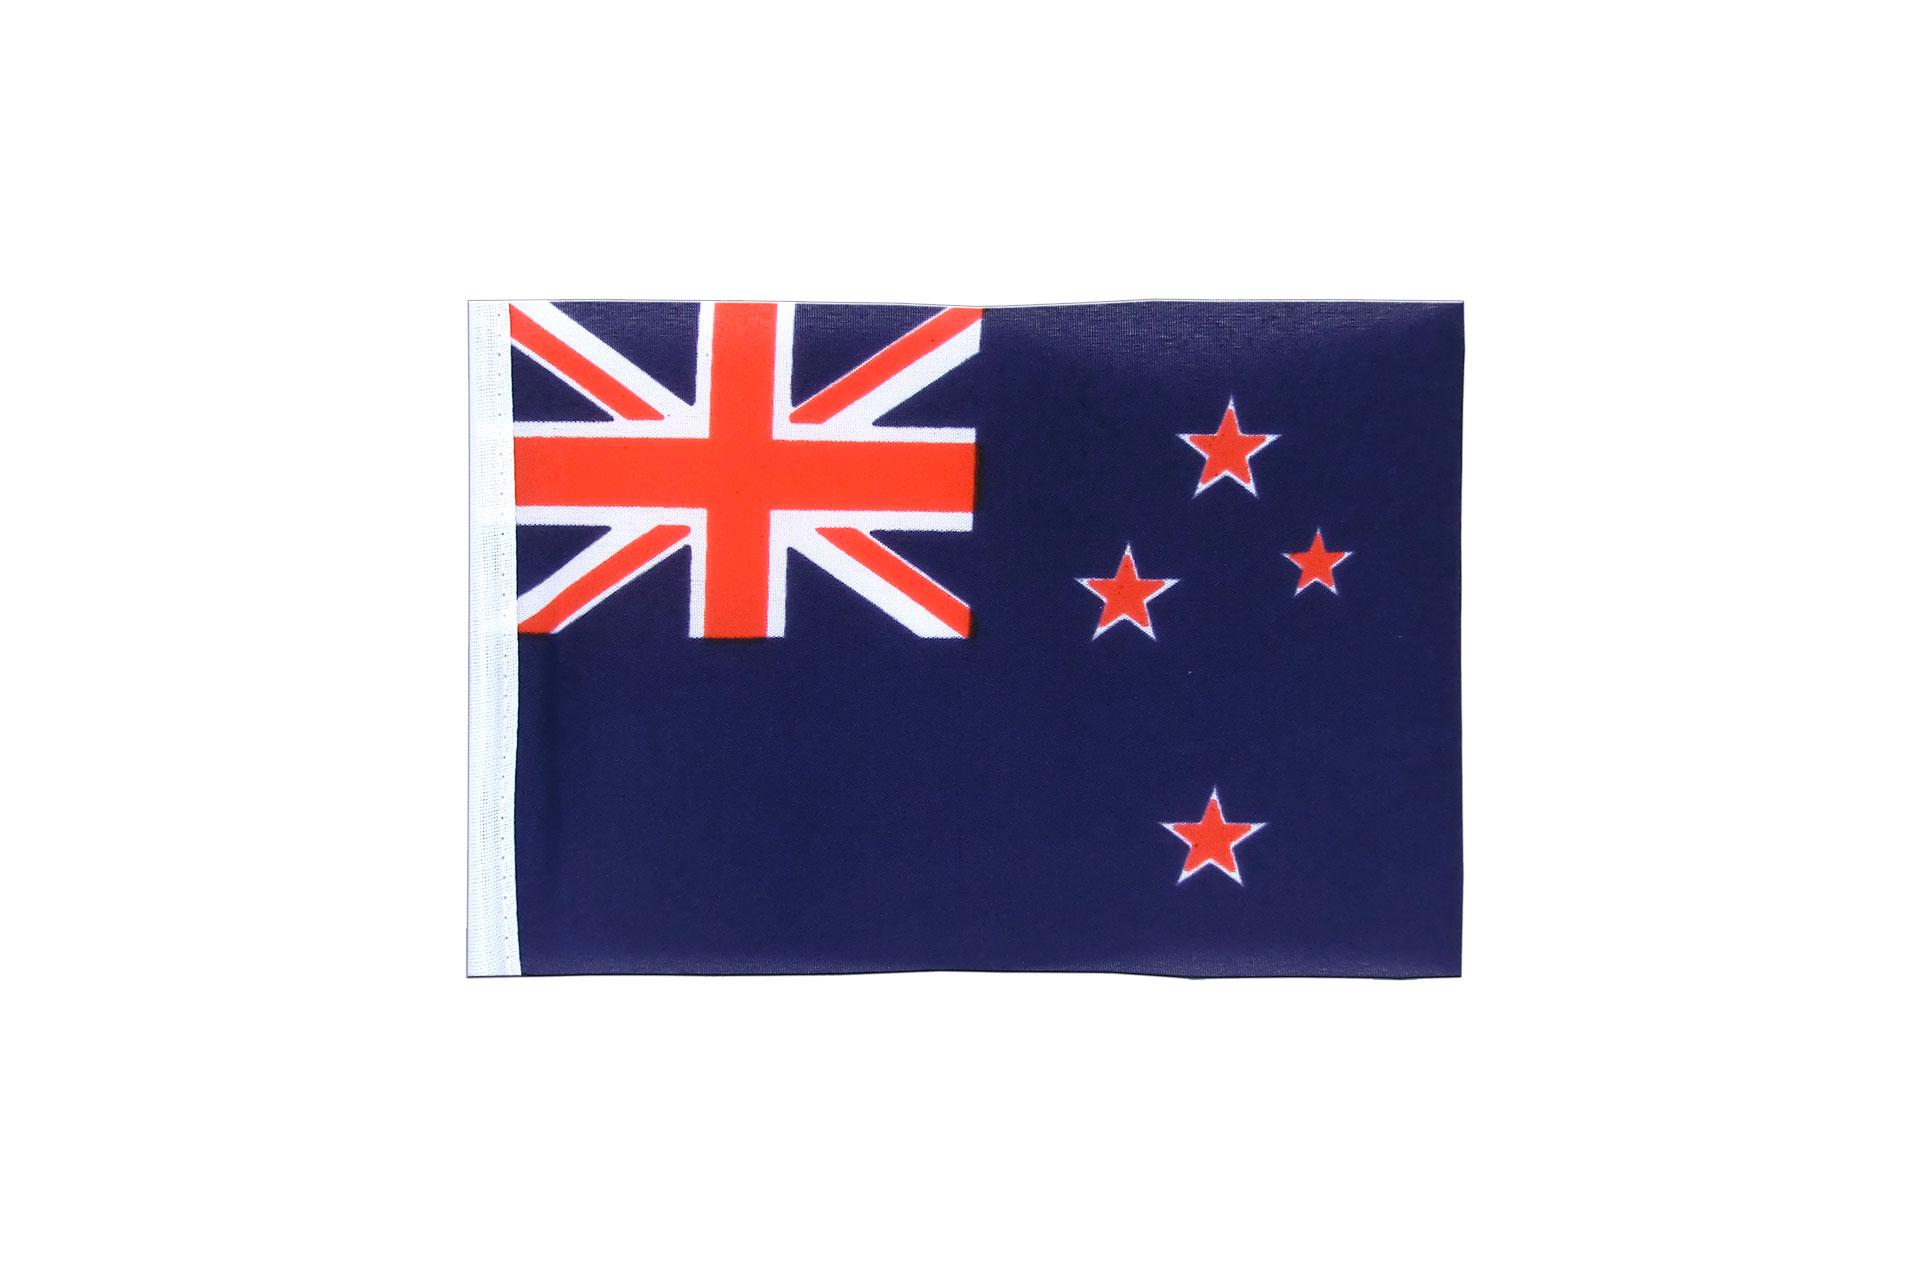 Mini New Zealand Flag  4x6  RoyalFlags